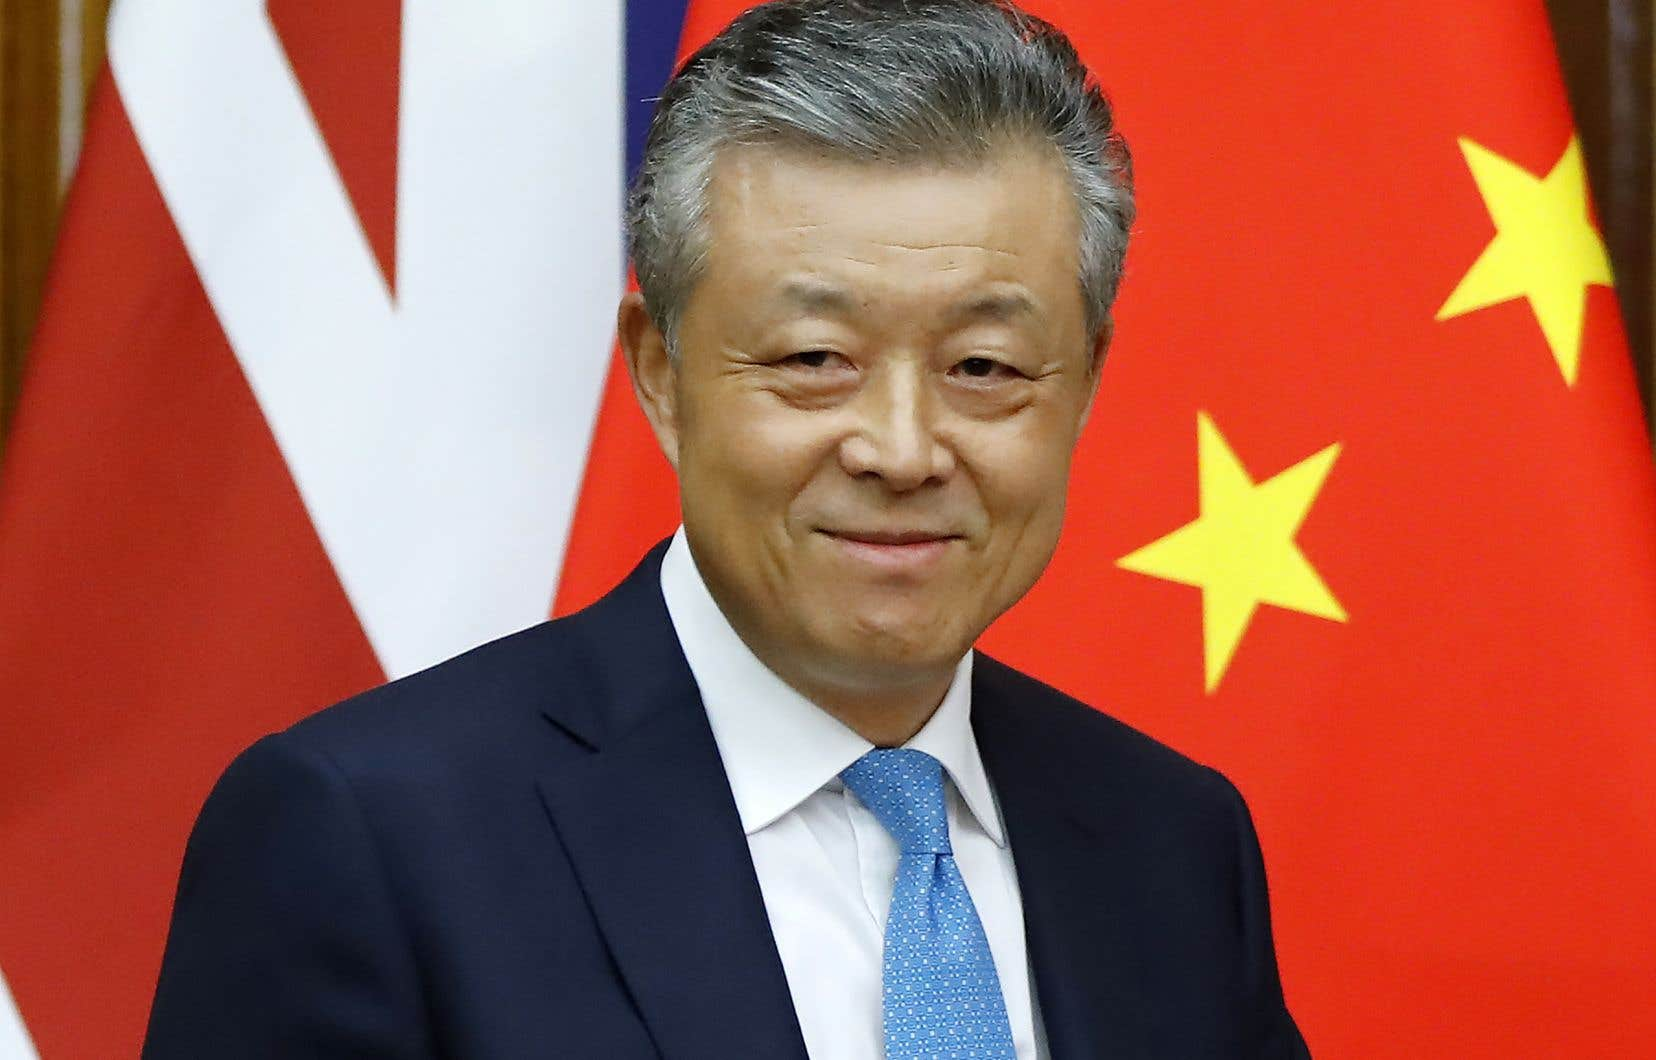 L'ambassadeur de Chine à Londres,Liu Xiaoming